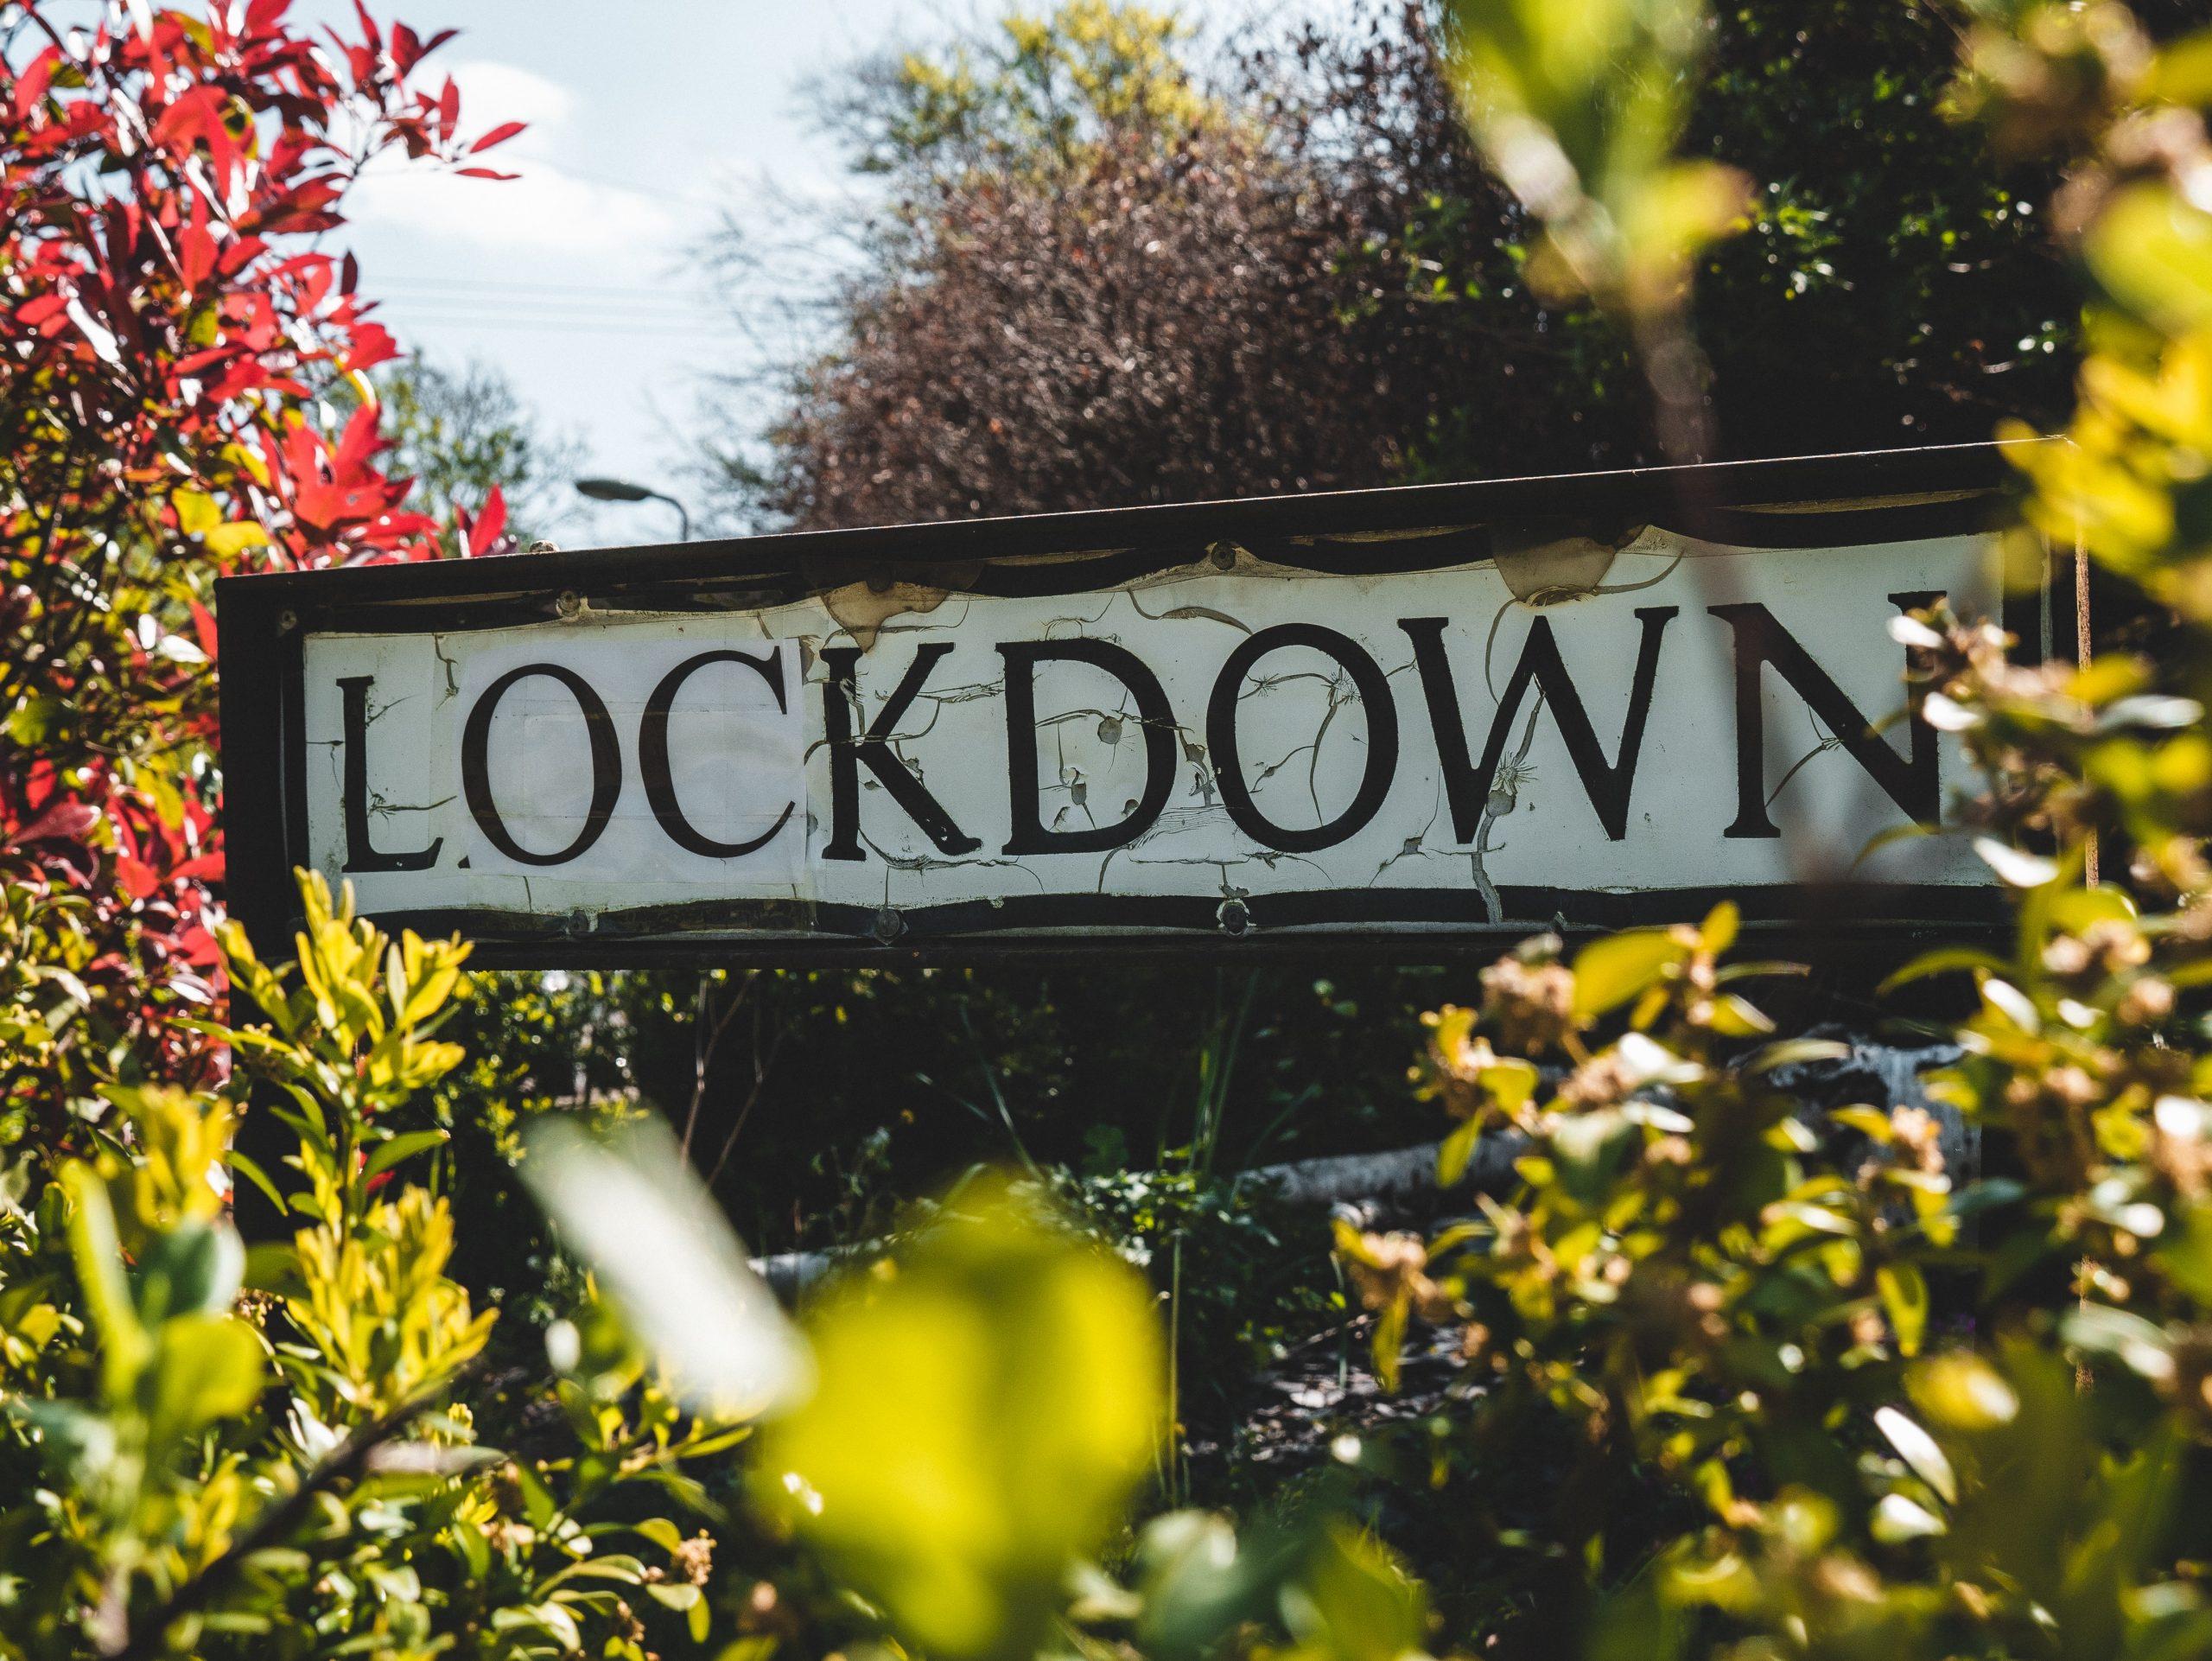 scritta lockdown